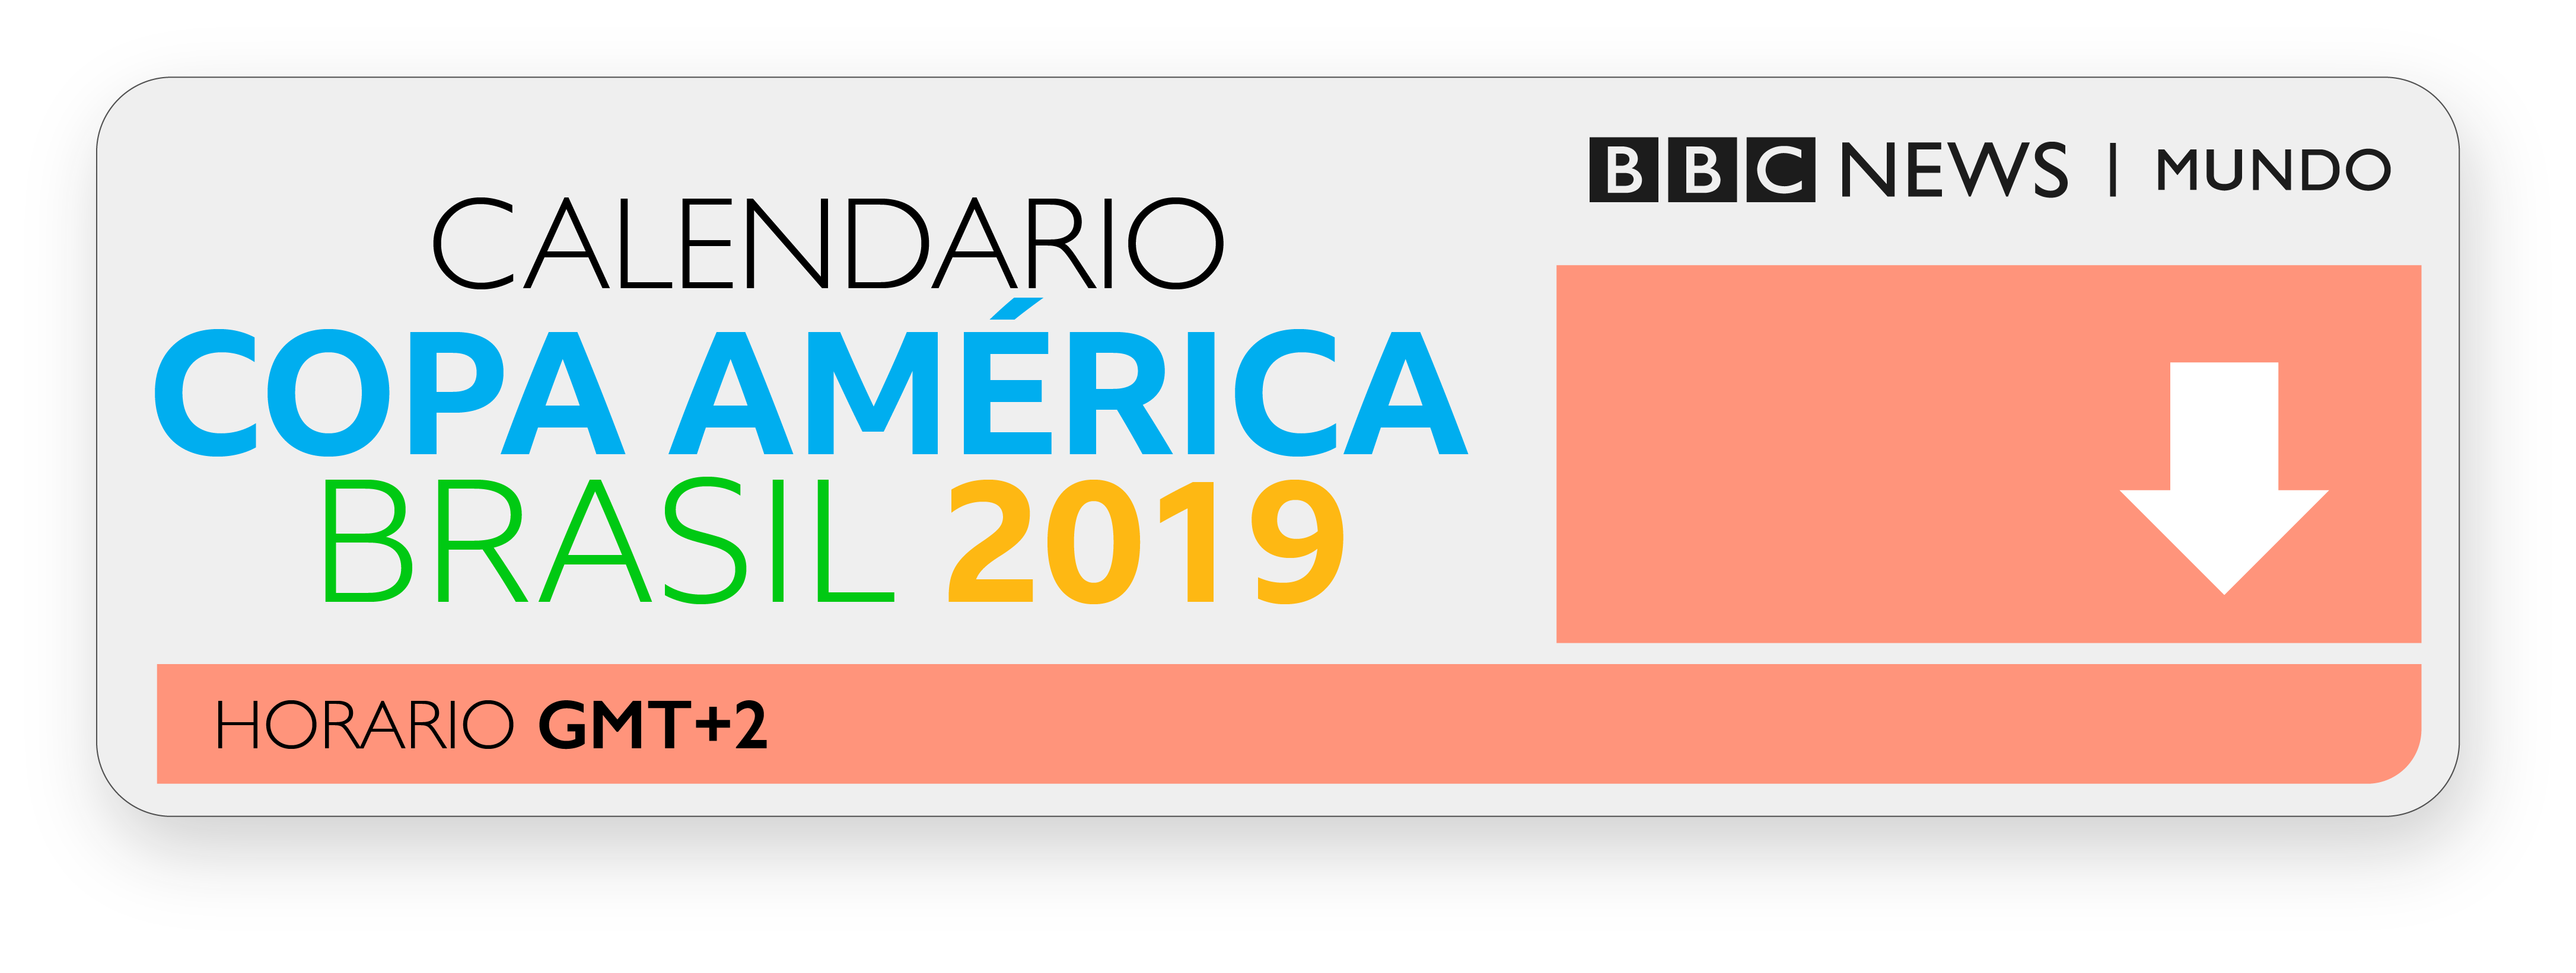 Calendario Copa.Copa America Brasil 2019 Descarga Aqui El Calendario De Partidos